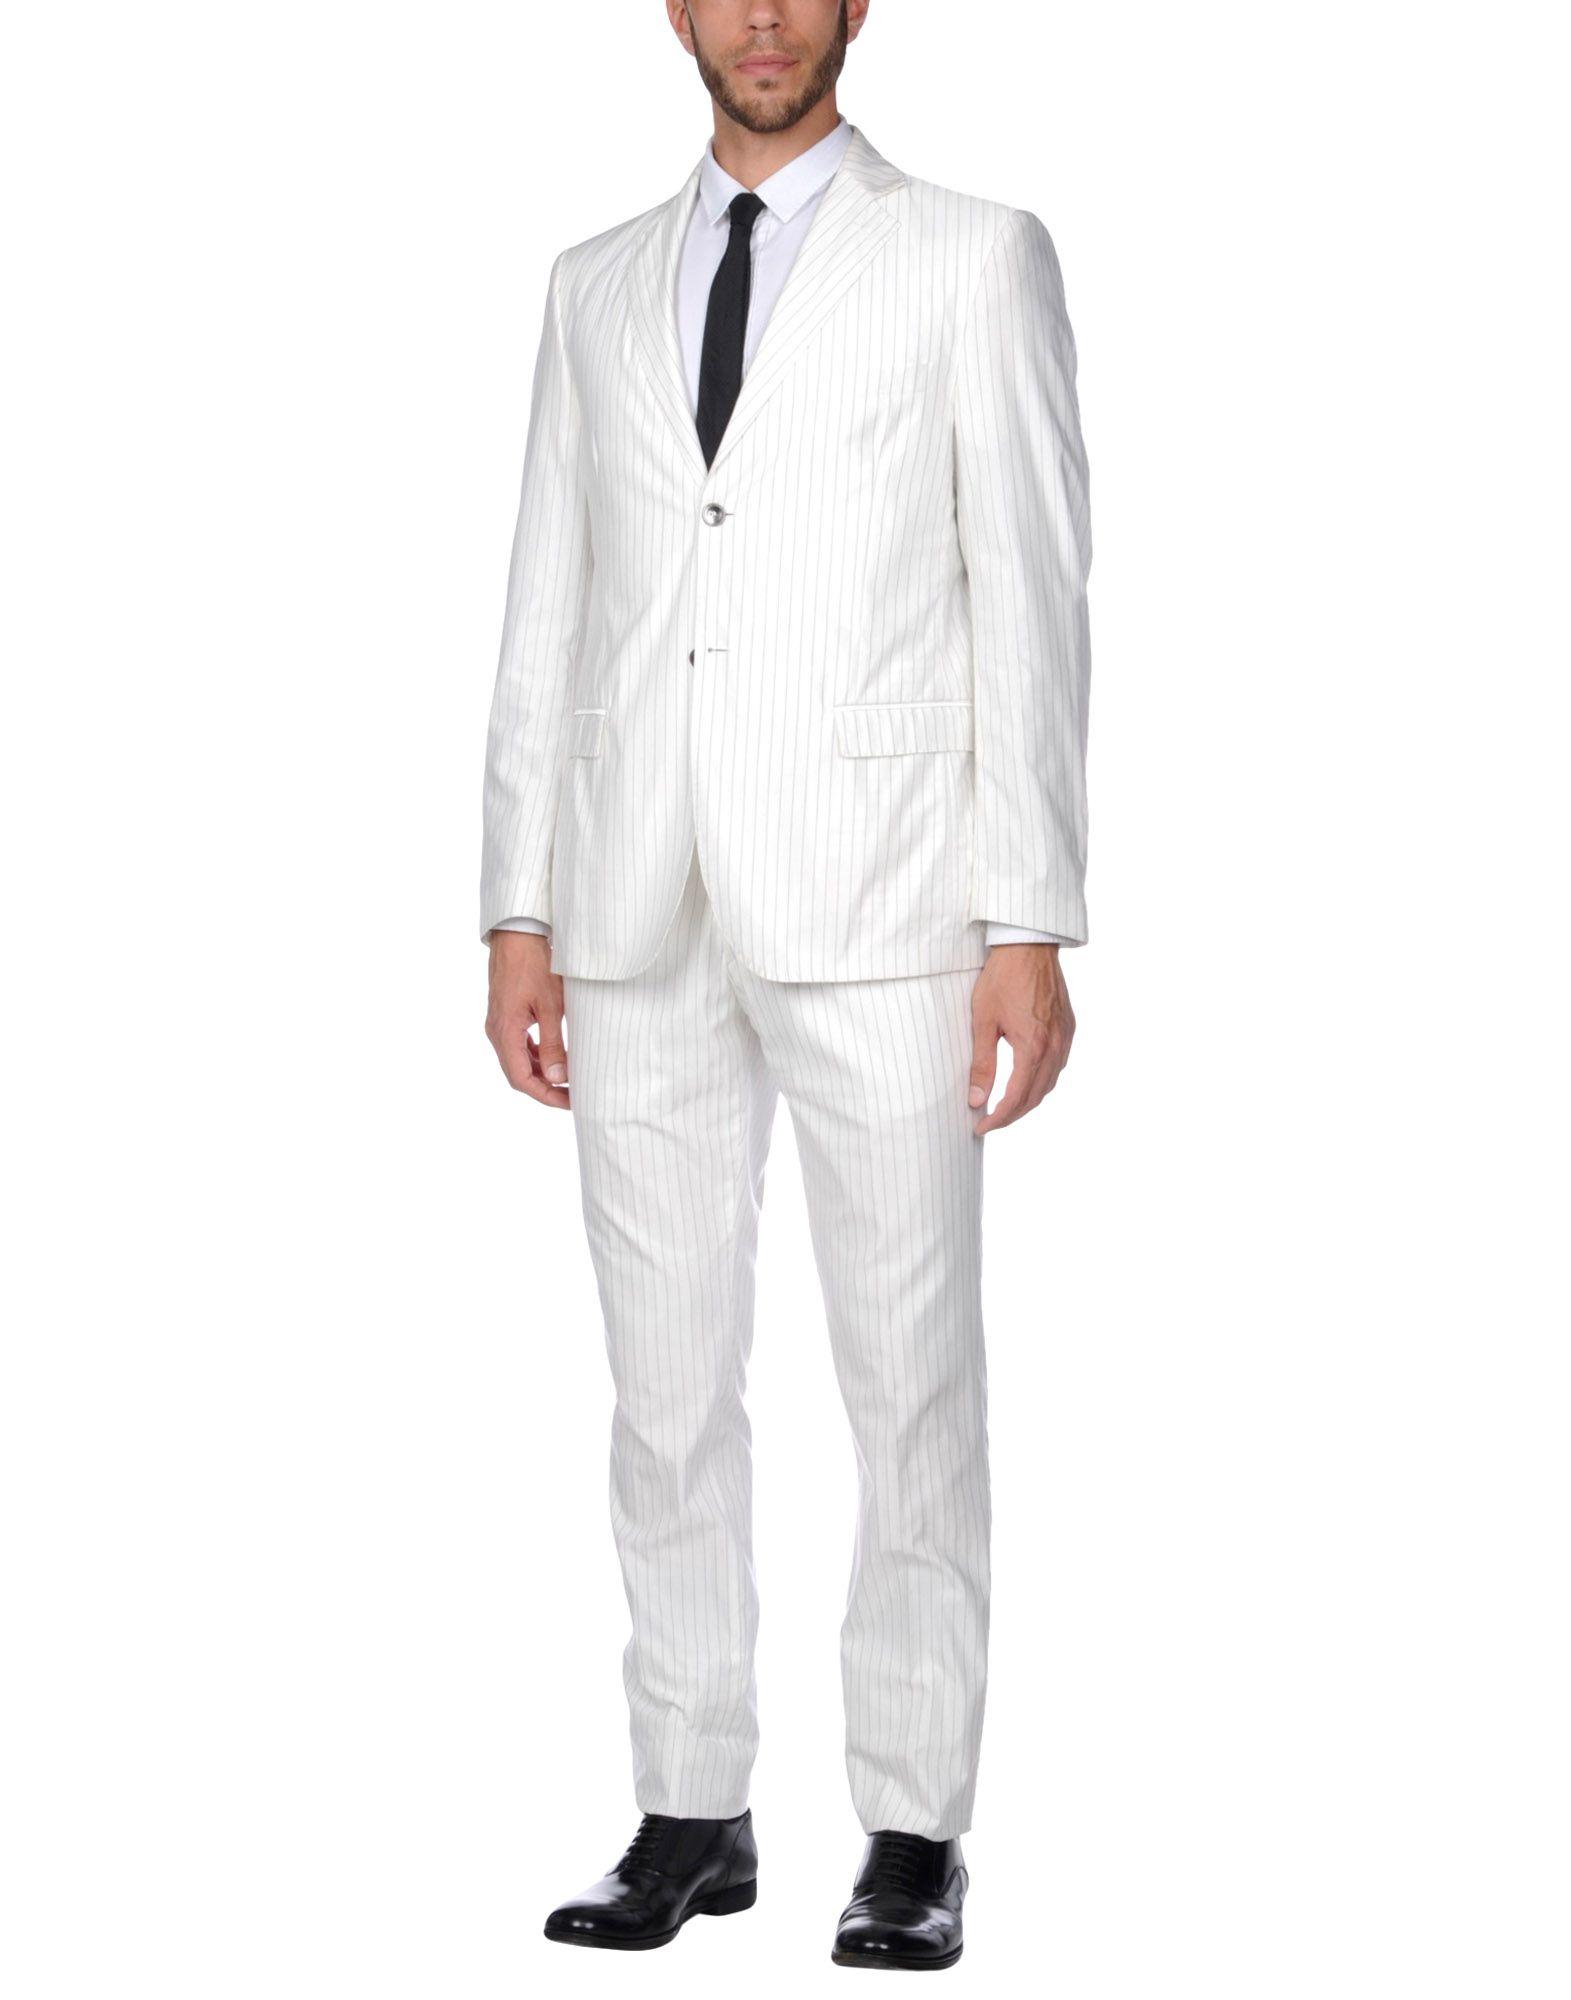 MONTEZEMOLO Suits in White